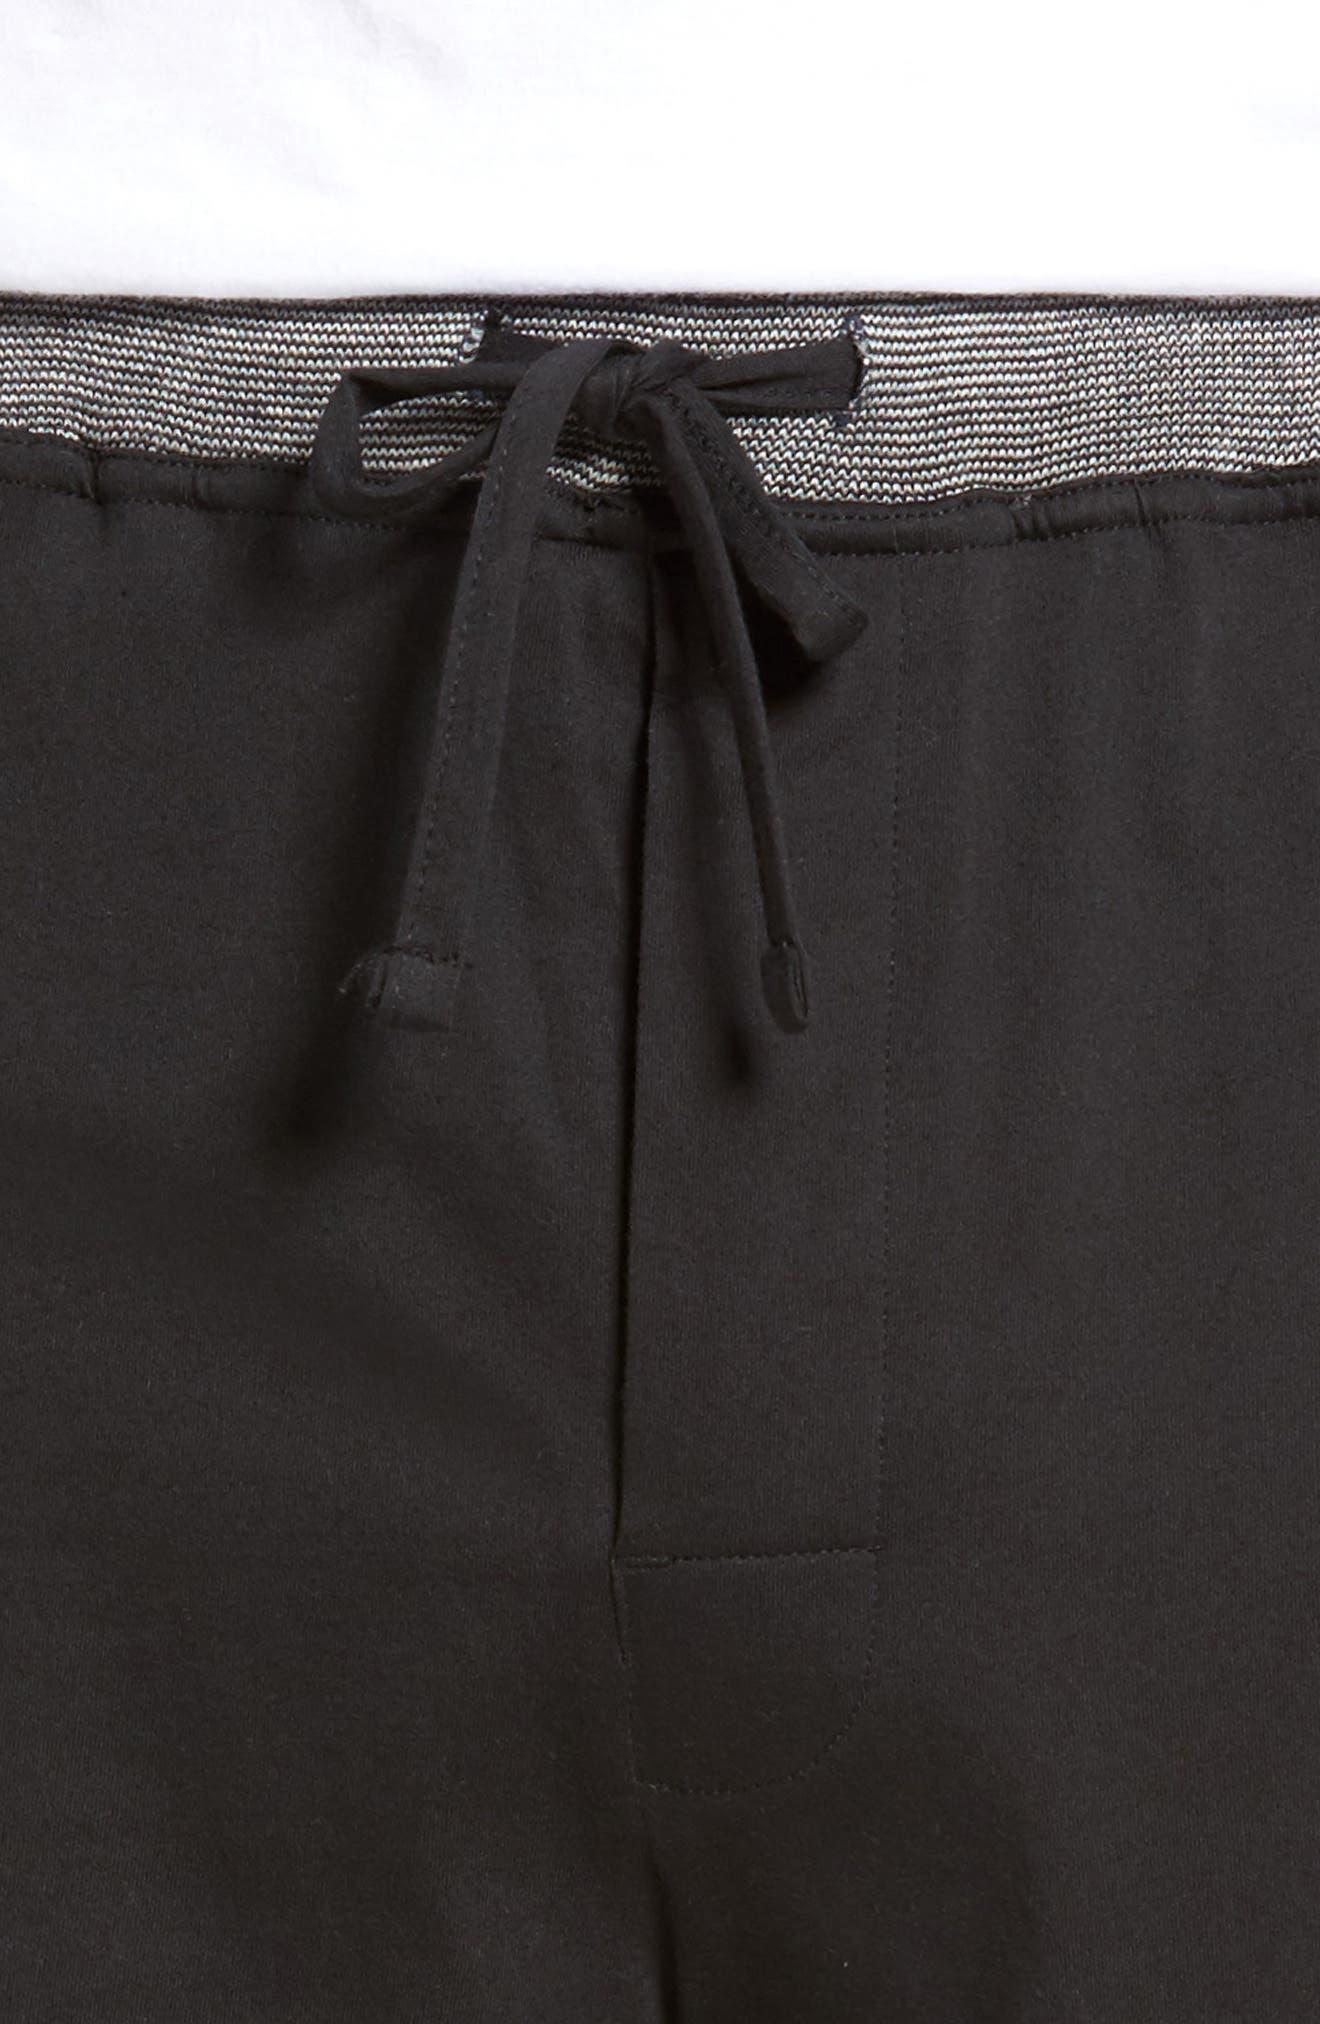 Cotton Lounge Shorts,                             Alternate thumbnail 4, color,                             Solid Black